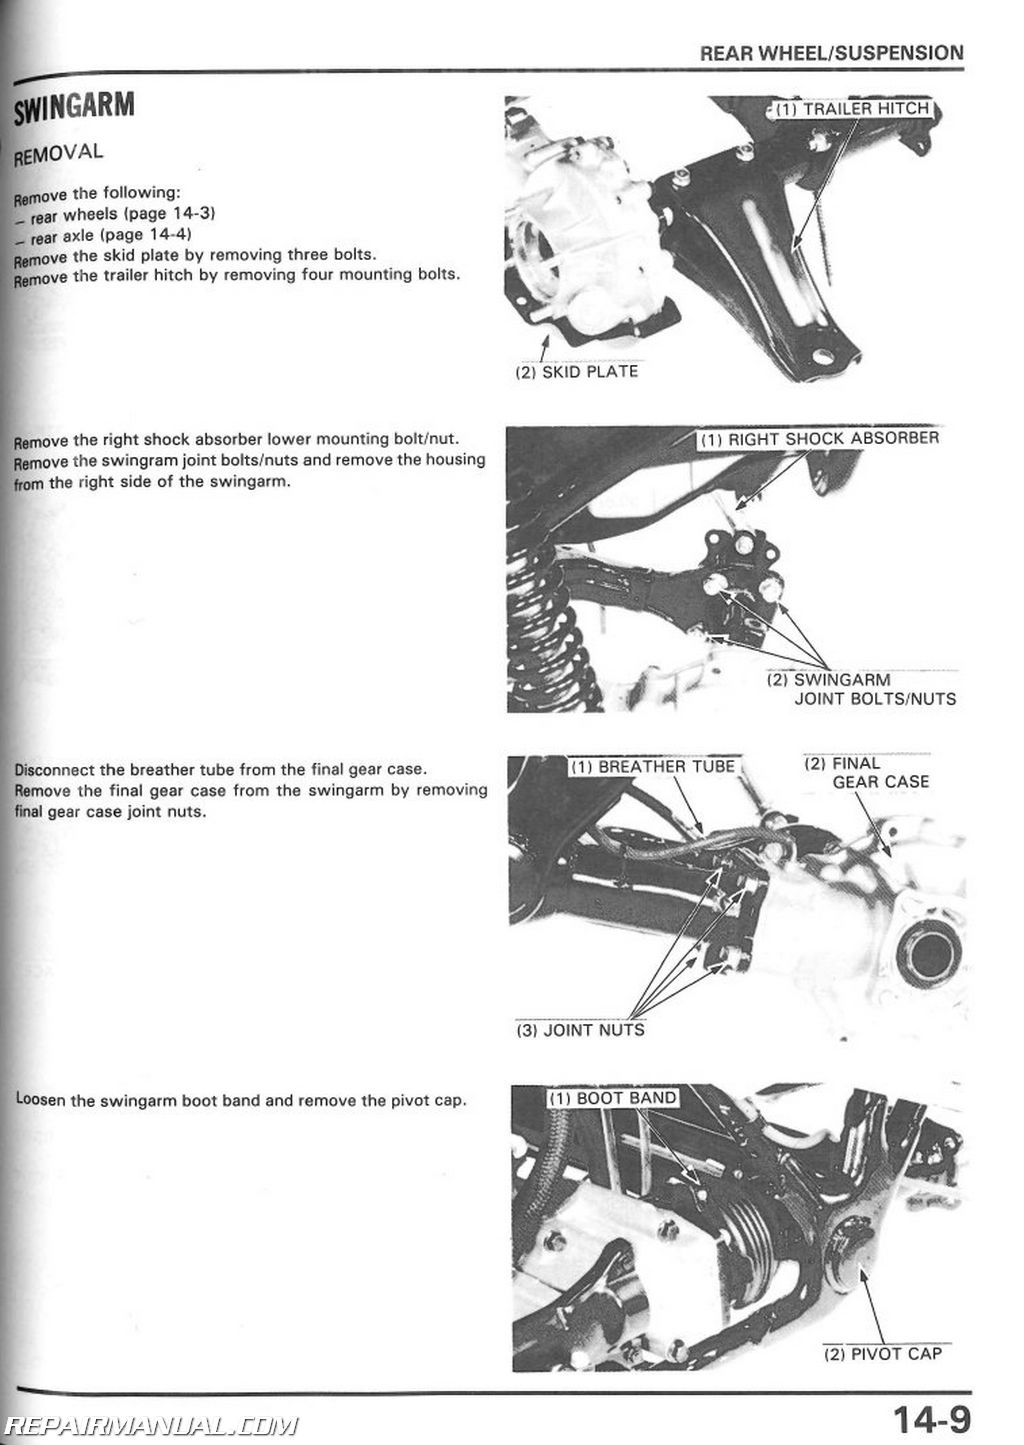 1986-1989 Honda TRX350 D Fourtrax Foreman ATV Repair Manual